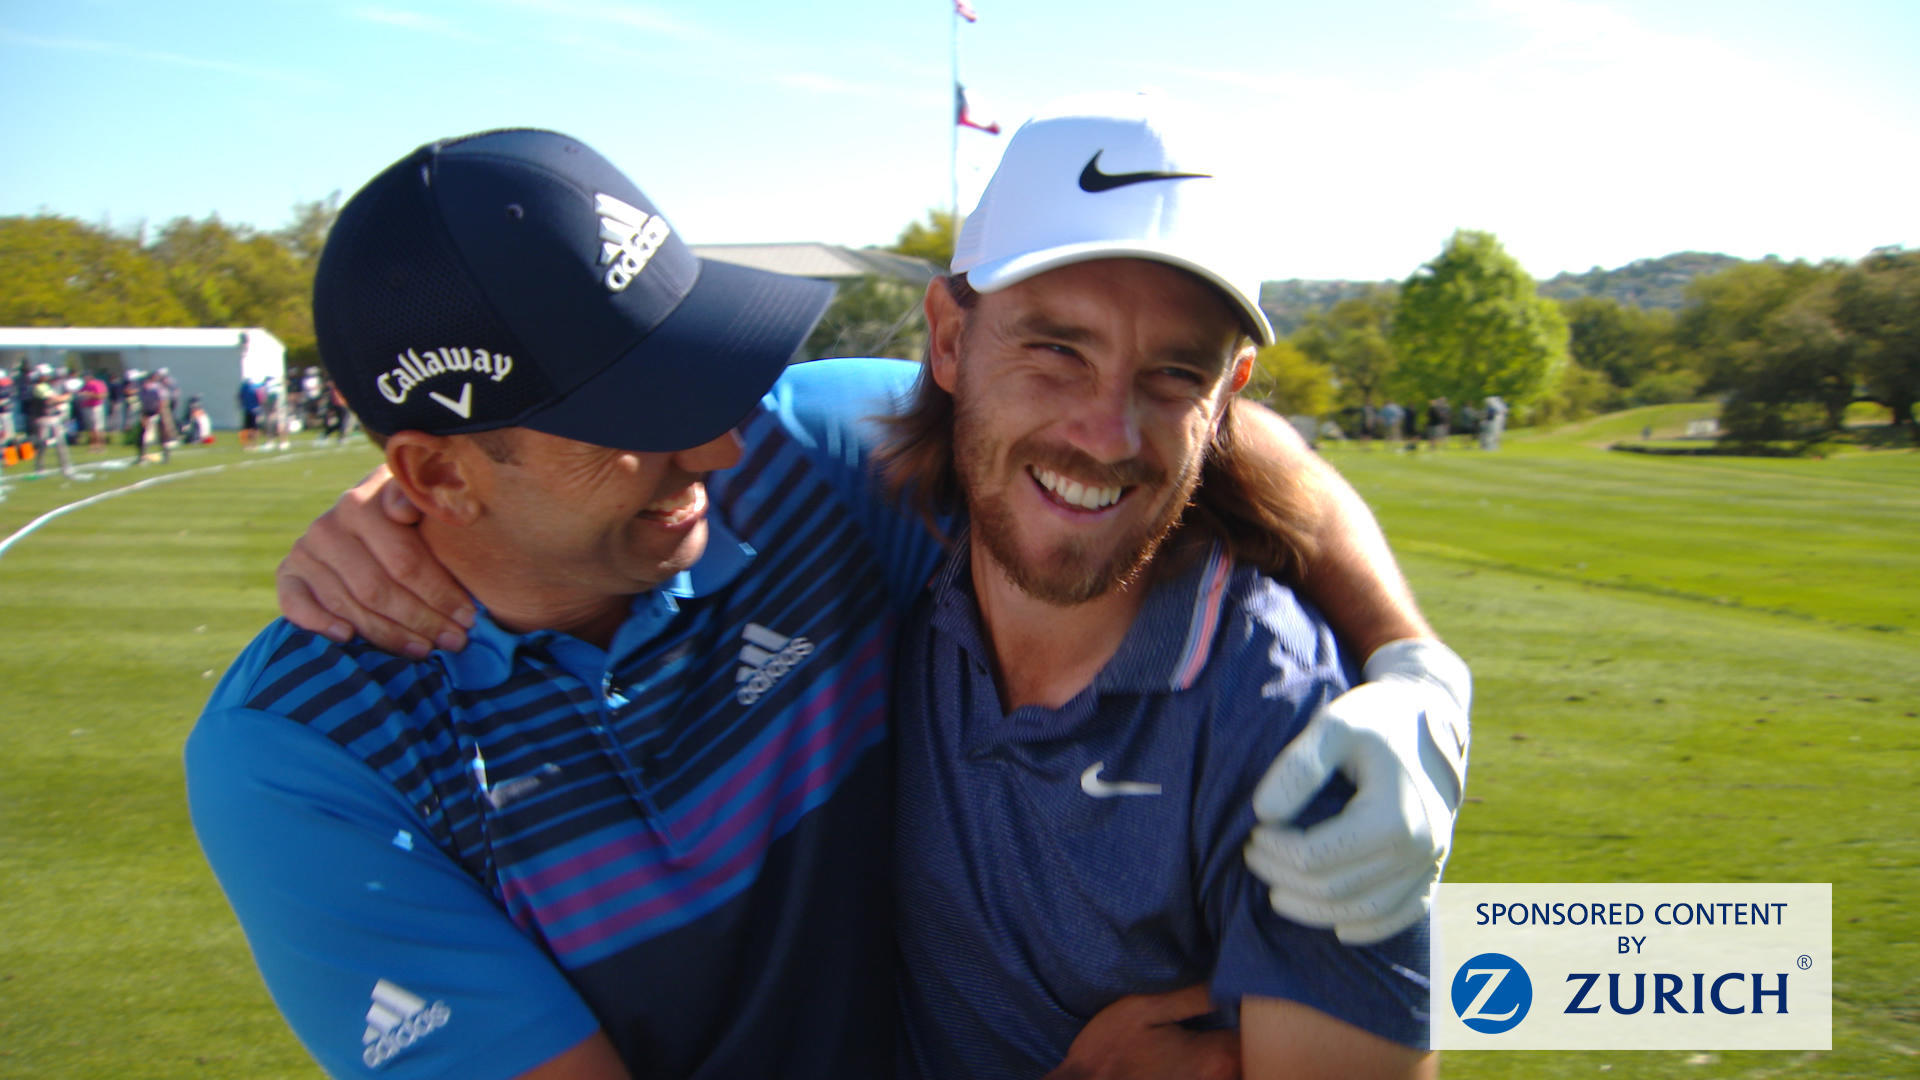 2019 RBC Heritage scores, grades: C.T. Pan edges Matt Kuchar to win first PGA Tour event